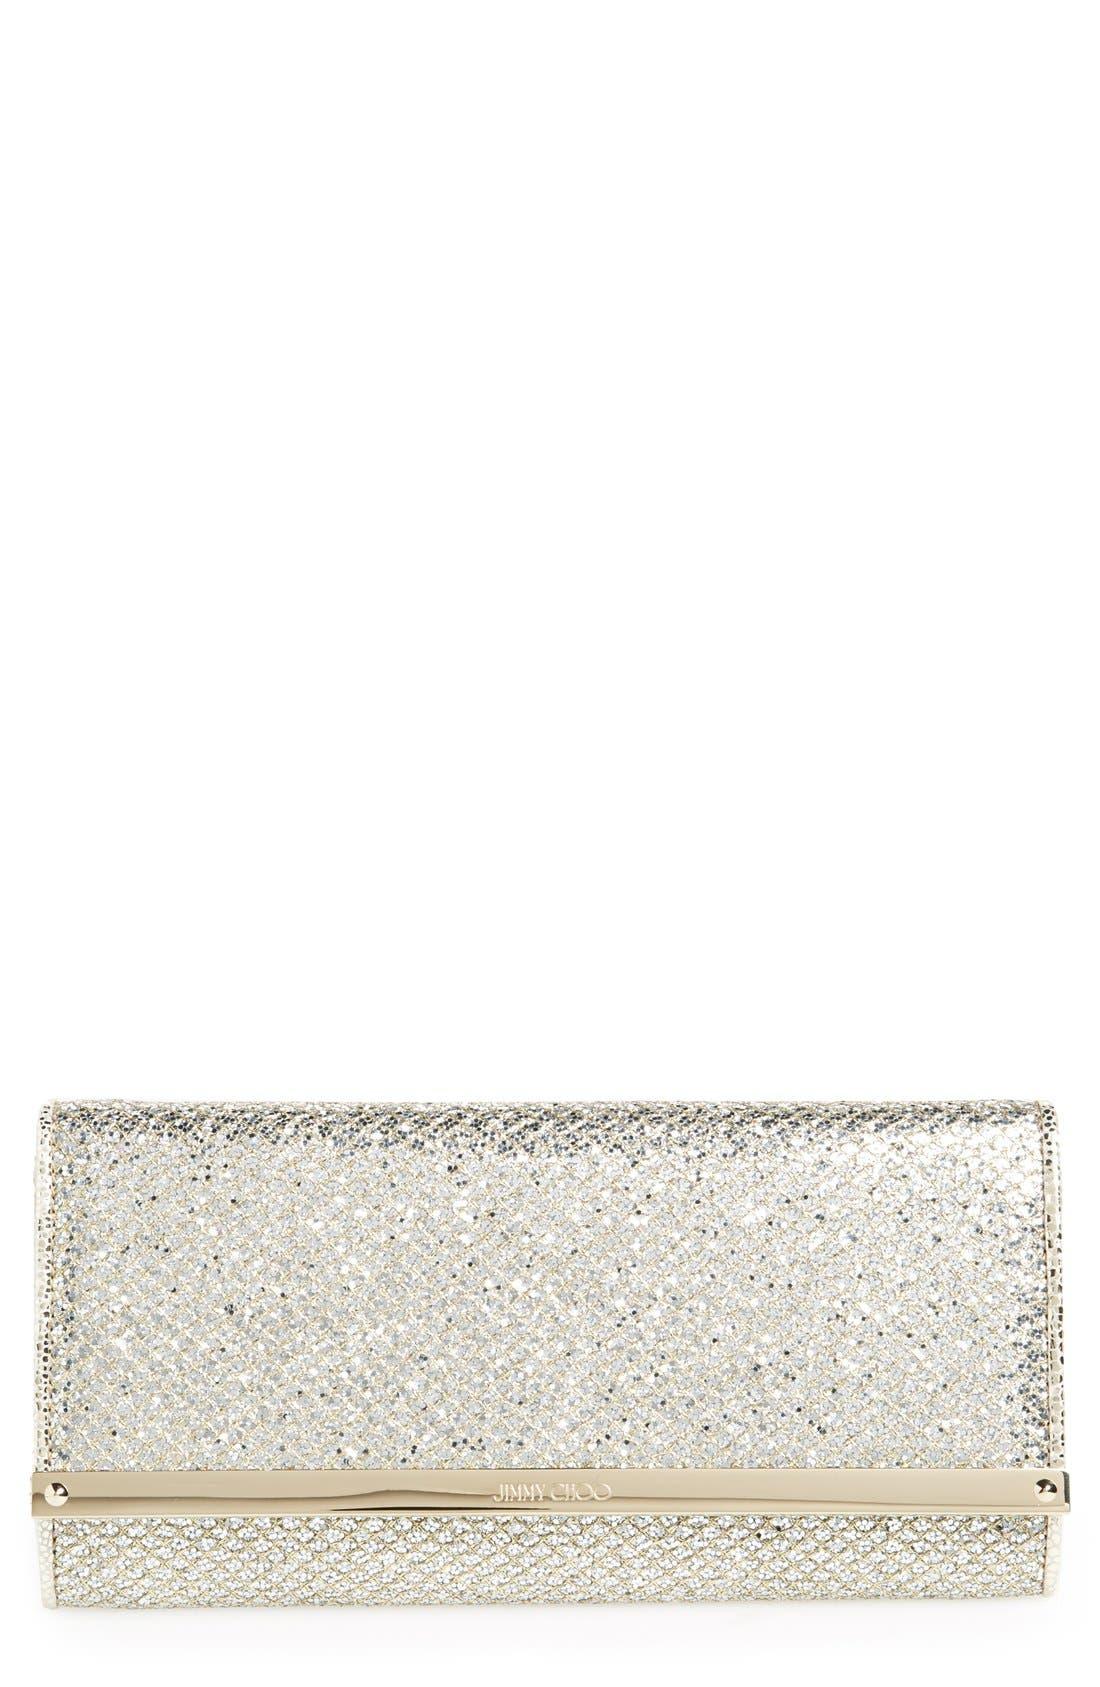 Main Image - Jimmy Choo 'Milla' Glitter Wallet on a Chain